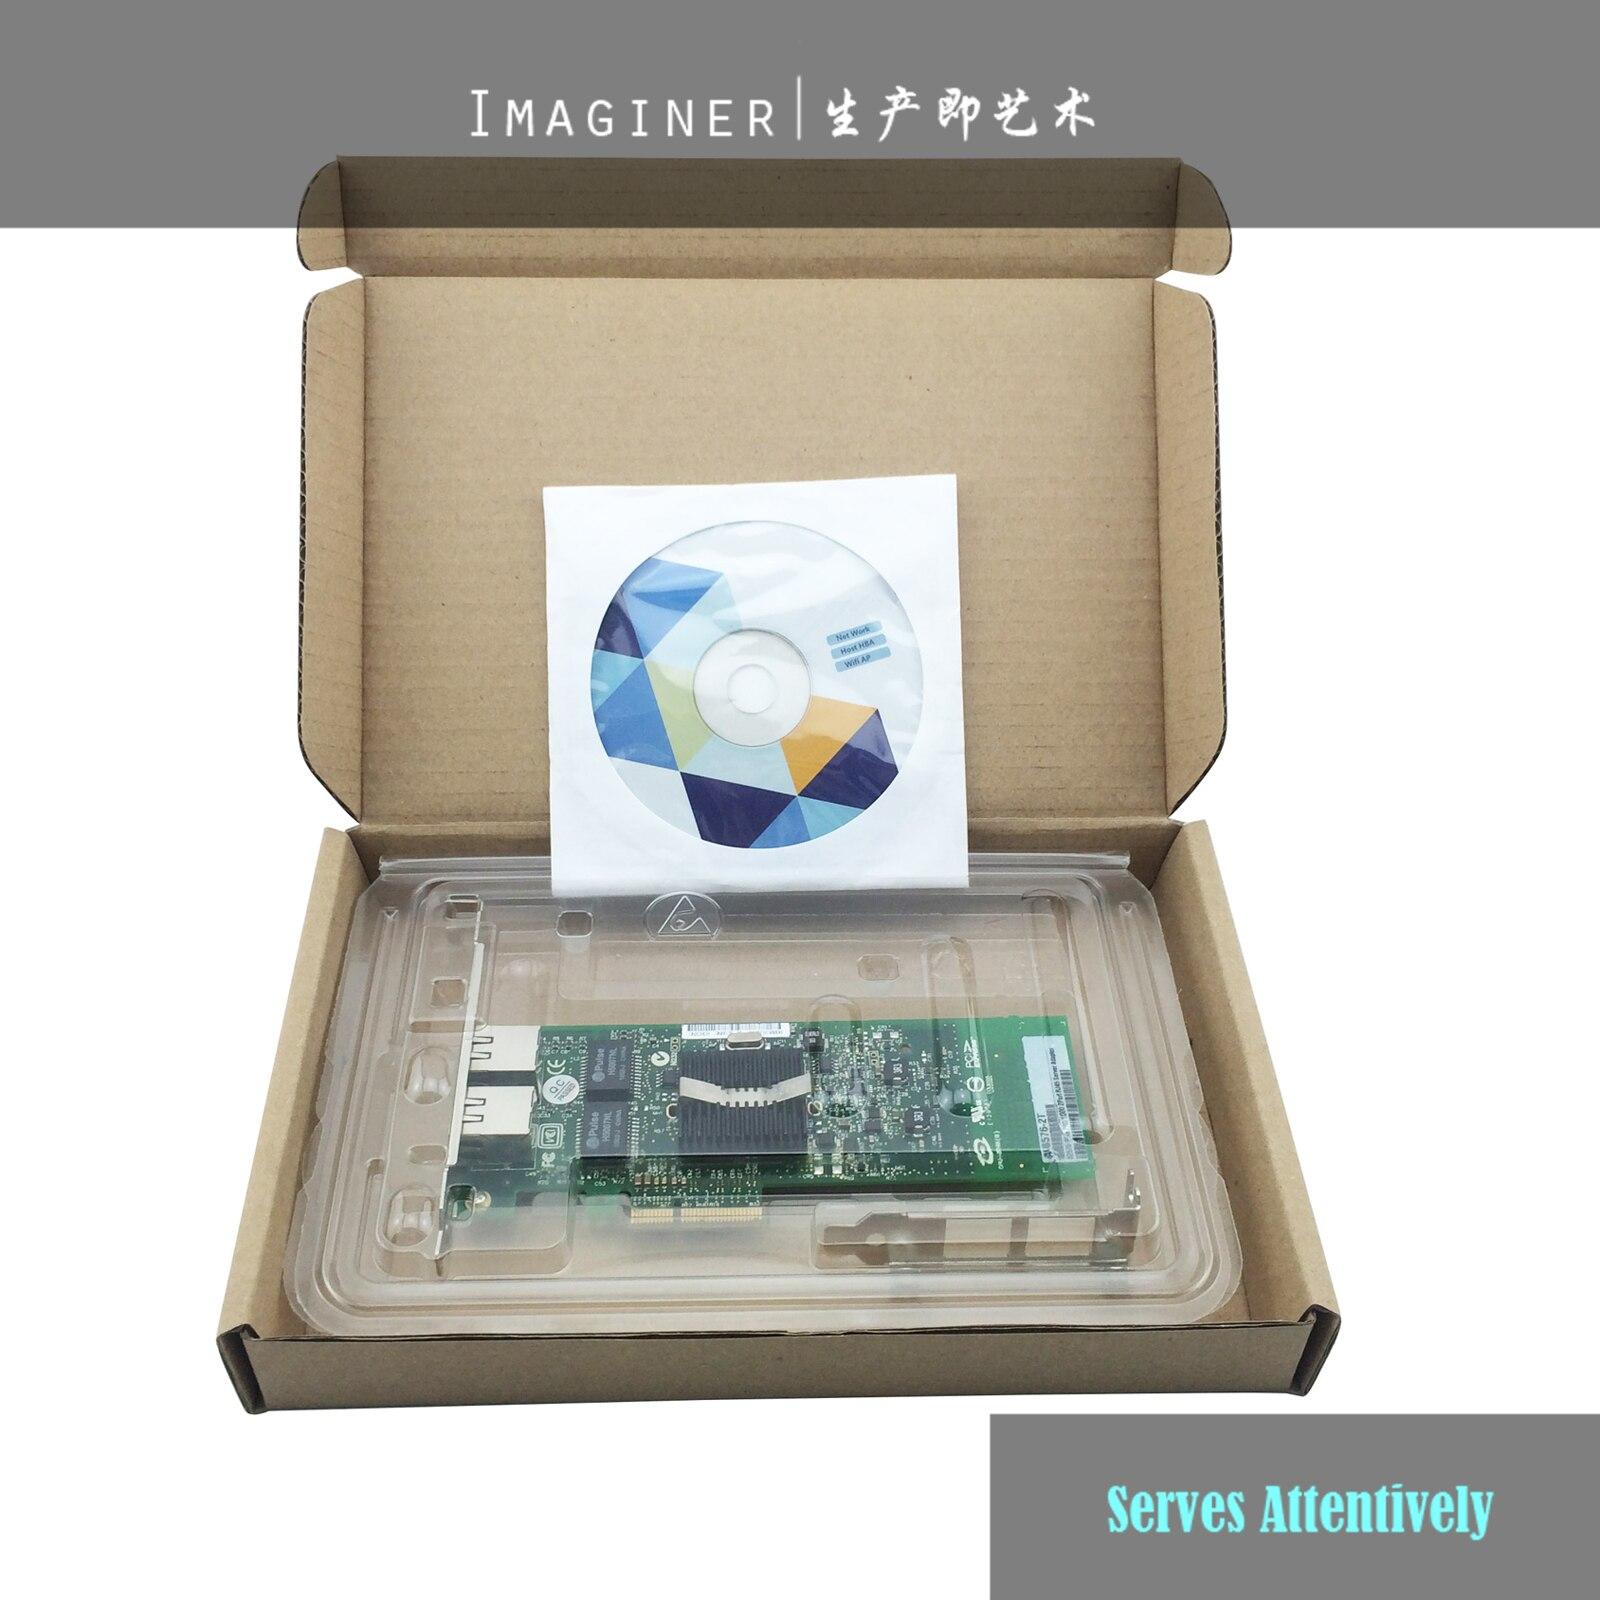 Alta calidad calcular productos 2 puertos Intel 82576 Chip Gigabit Ethernet, servidor adaptador PCI-e Gigabit Ethernet E1G42ET RJ45 puerto